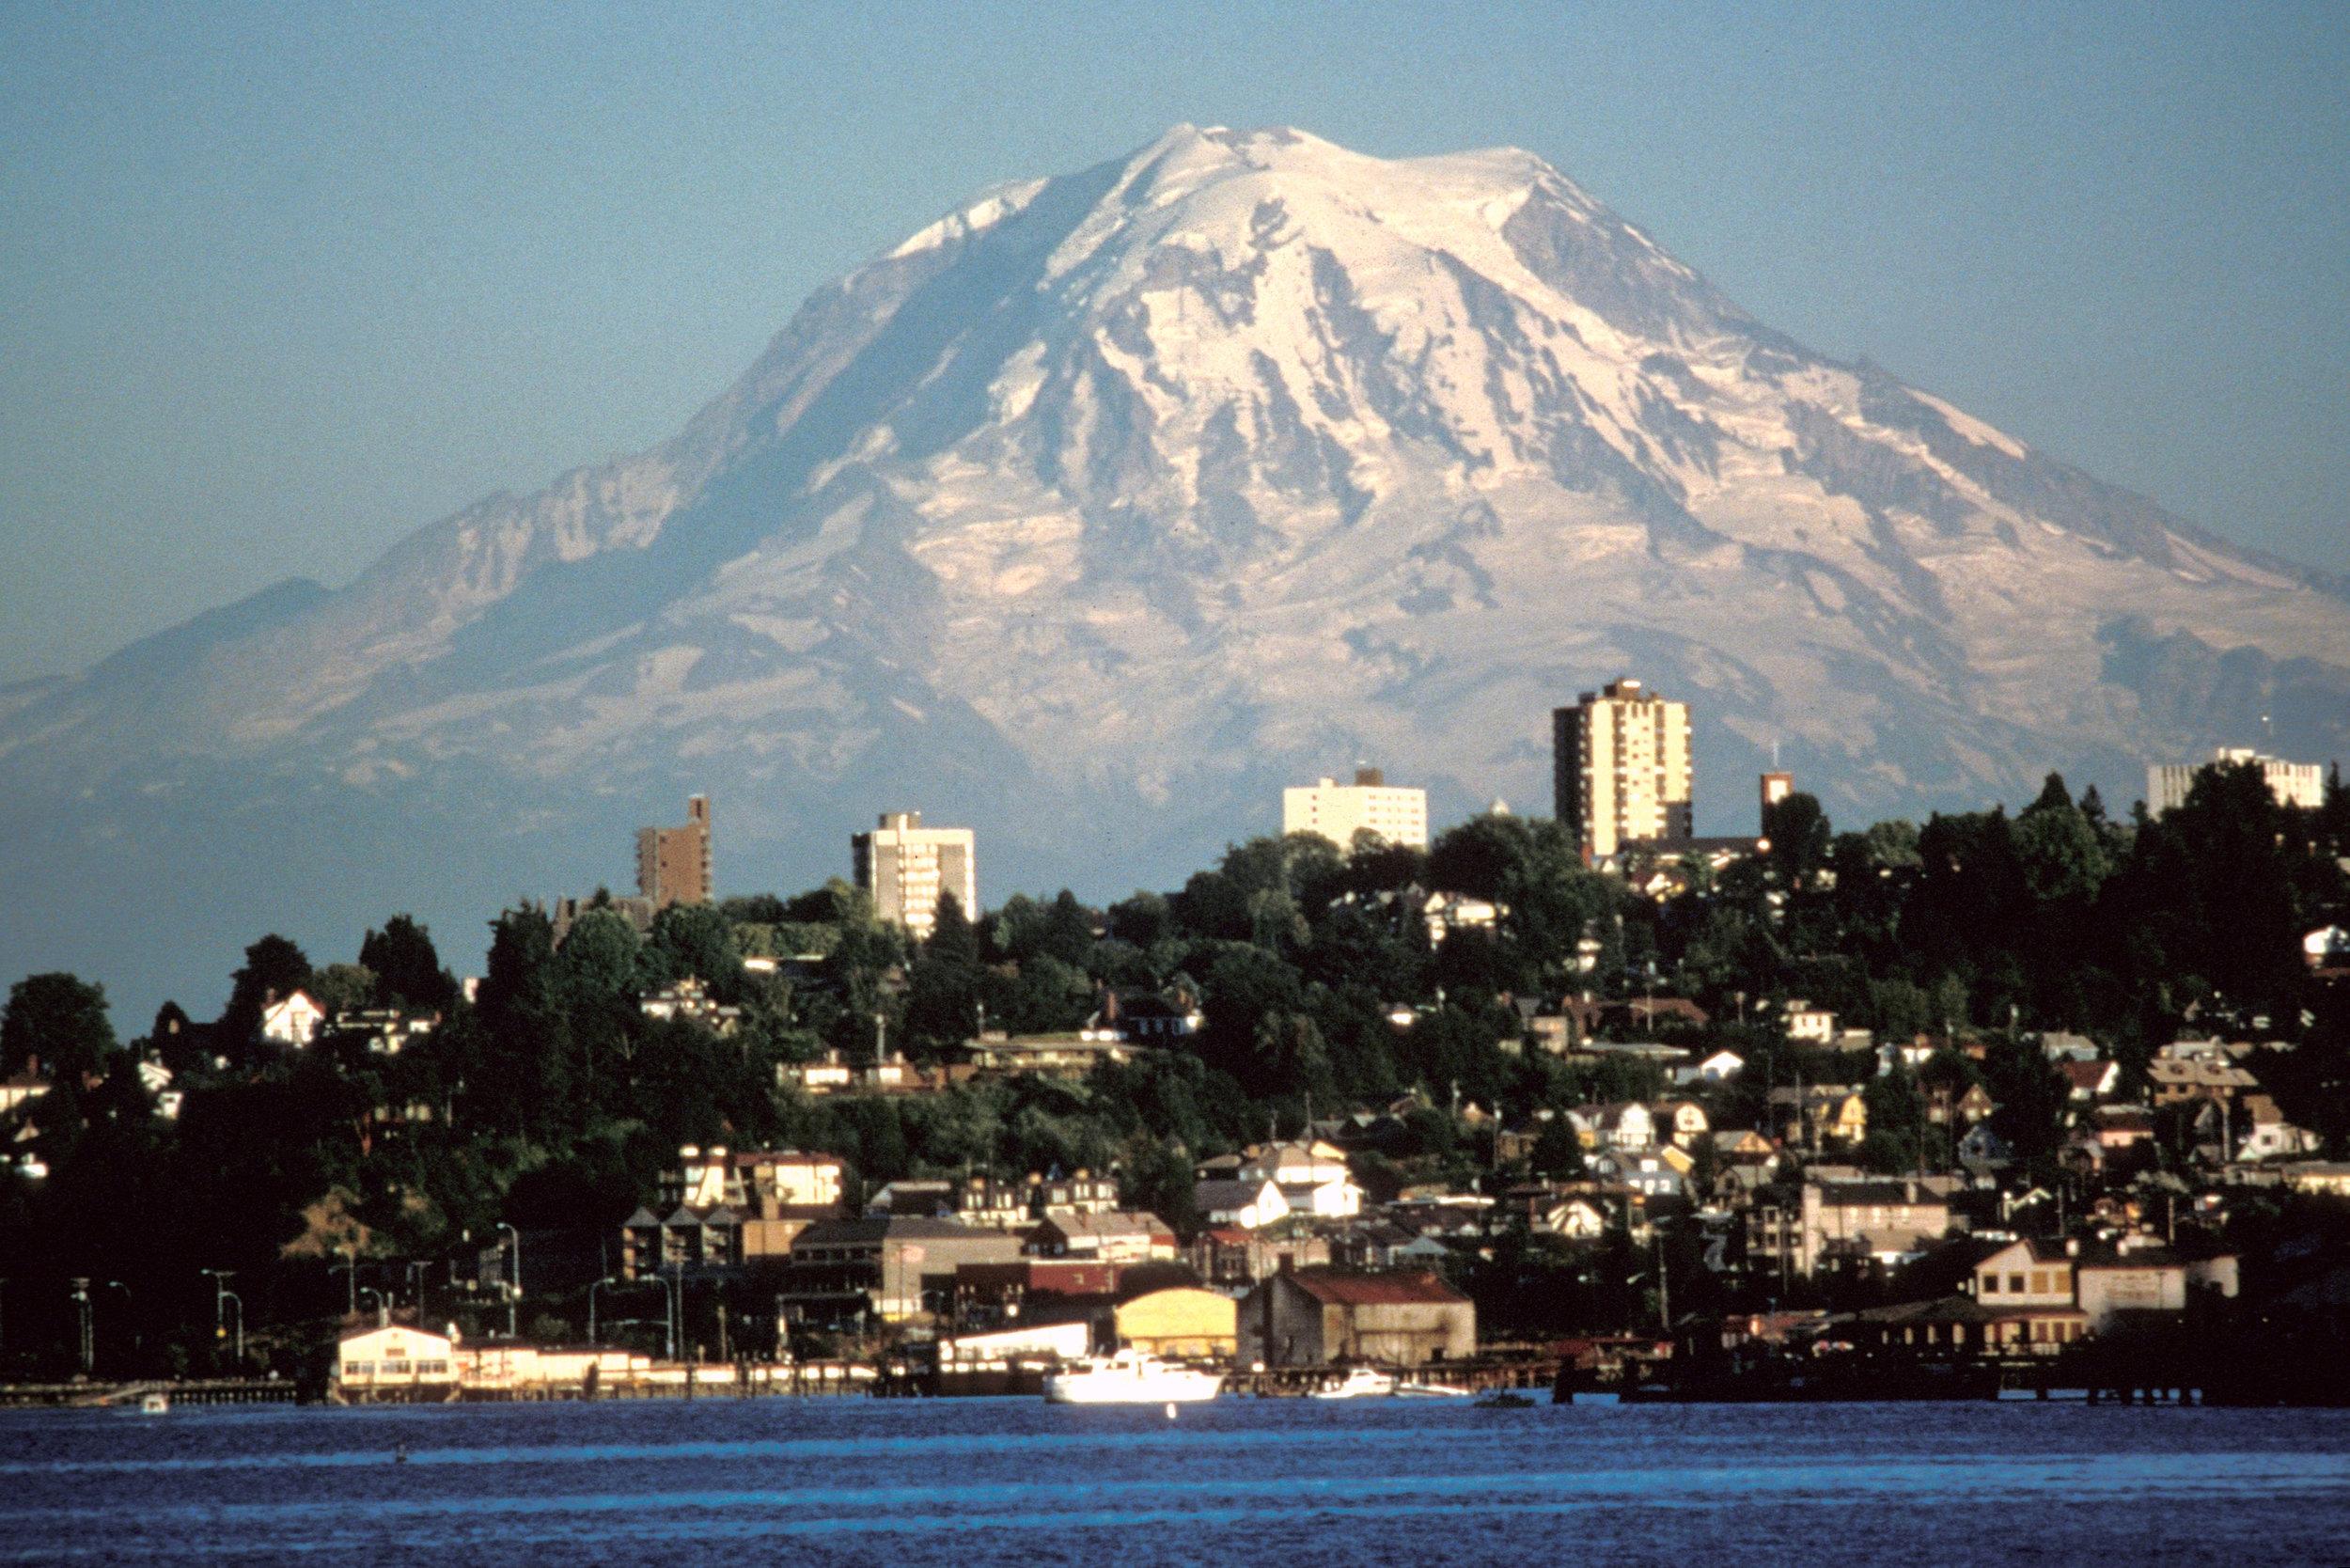 tacoma-with-a-view-mount-rainier-washington.jpg